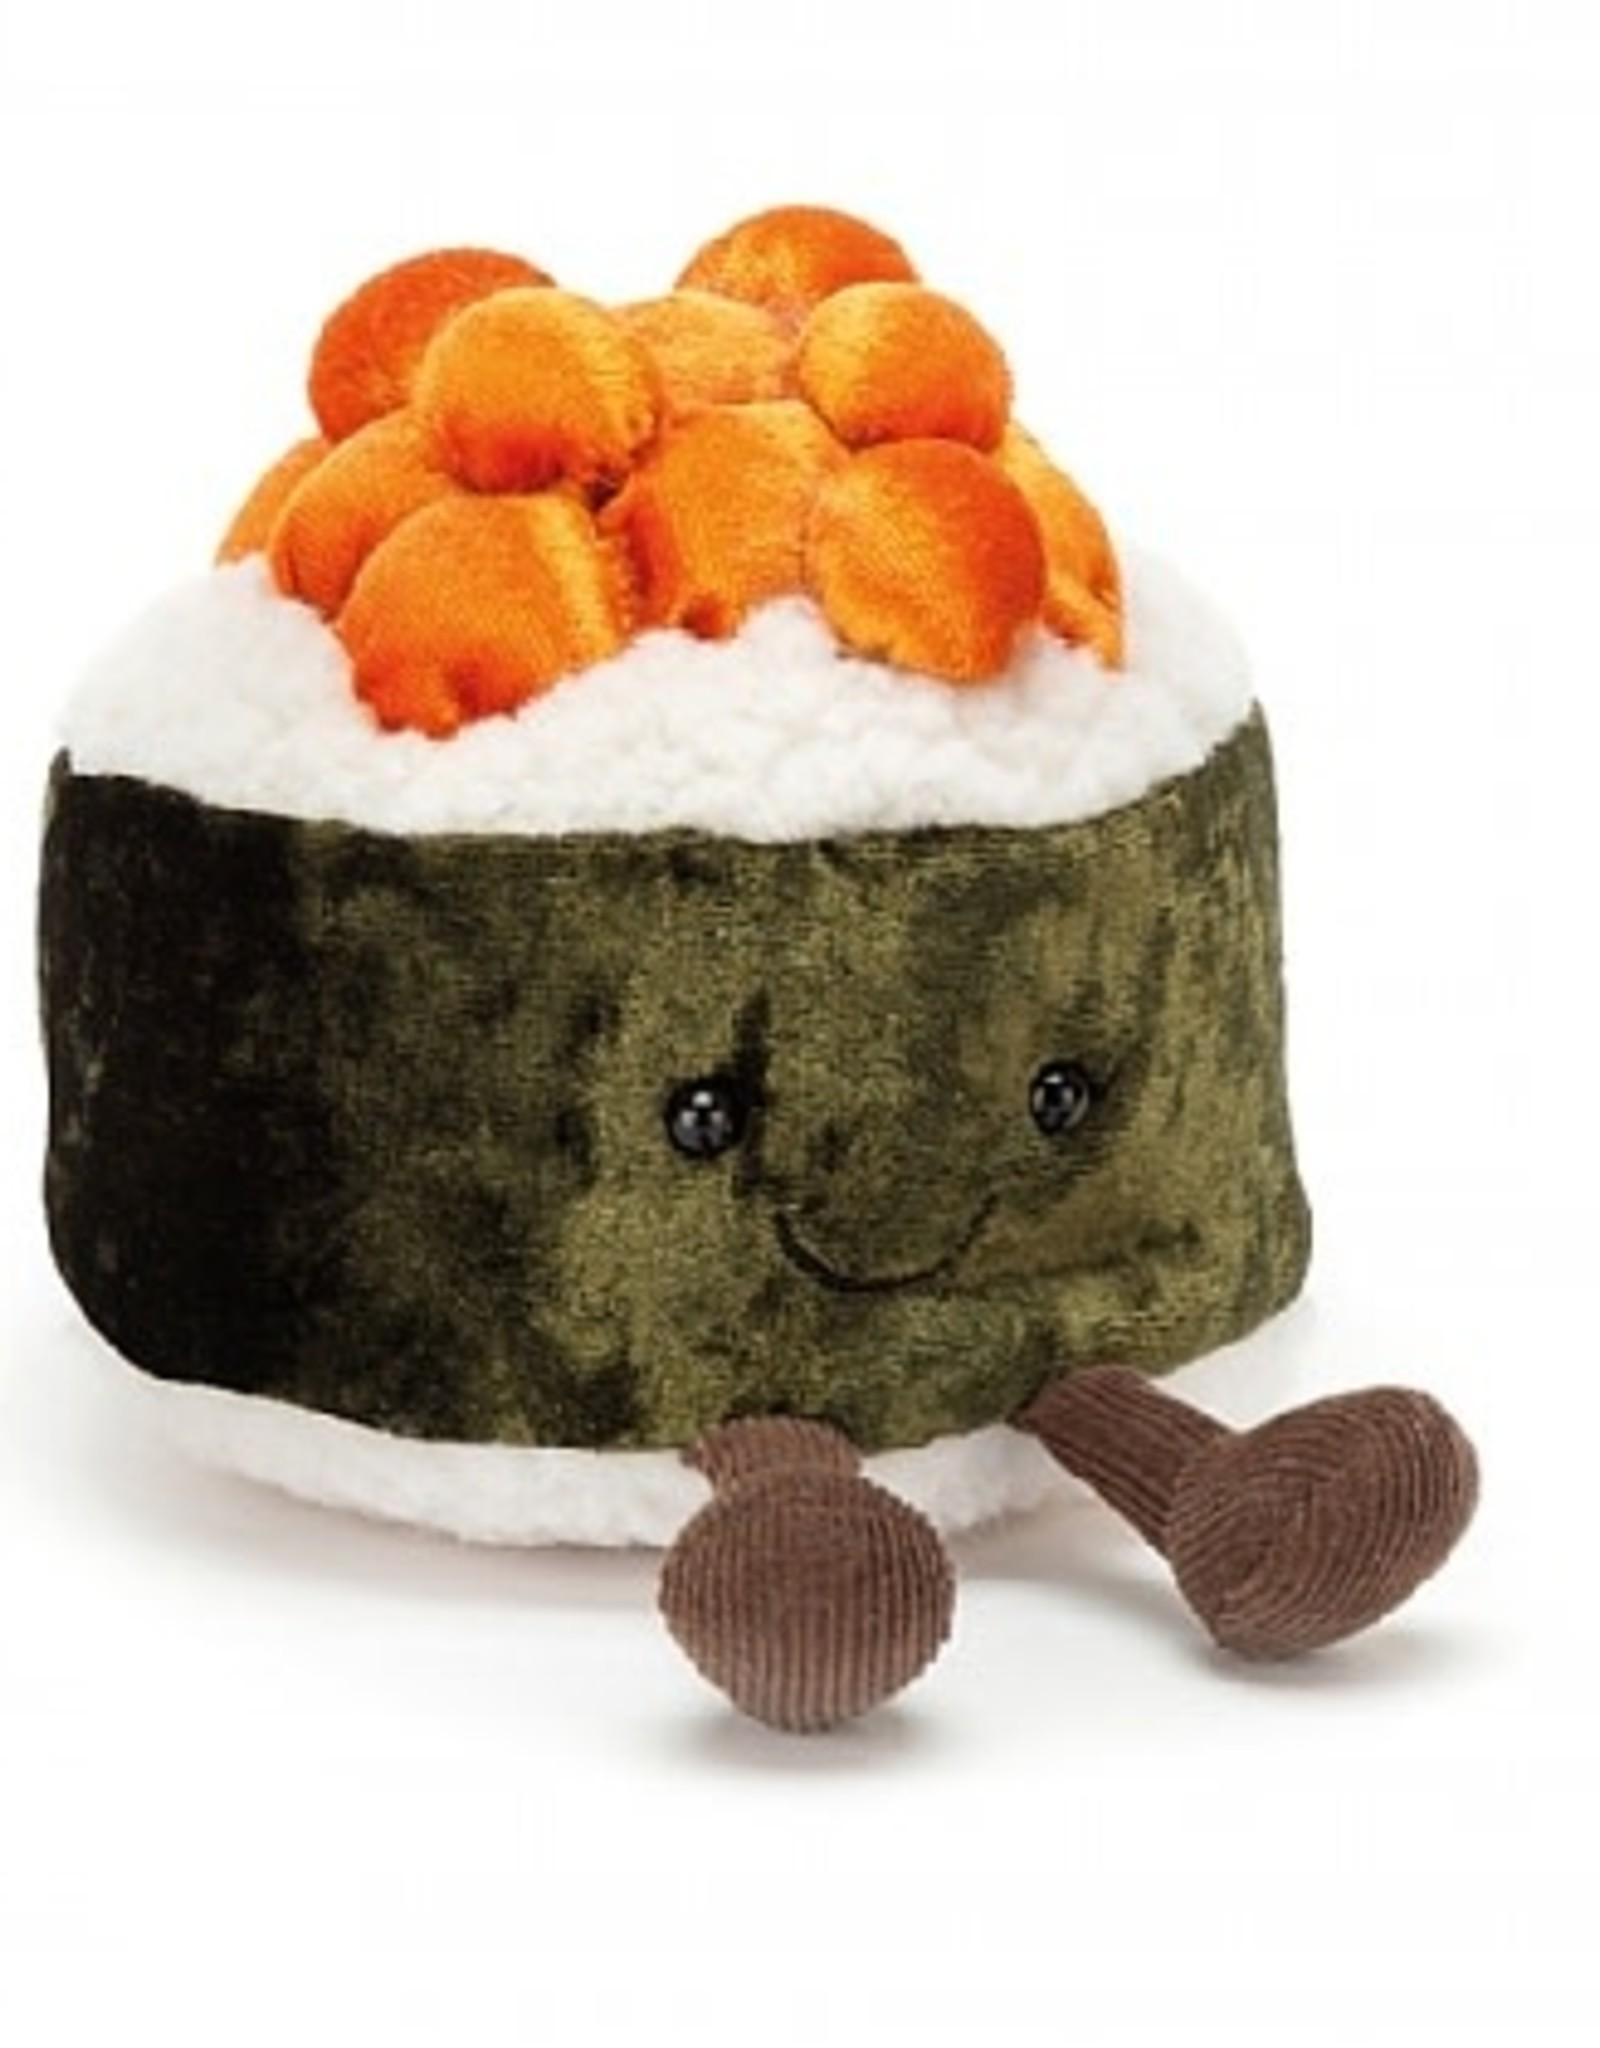 Jellycat Silly Sushi Maki